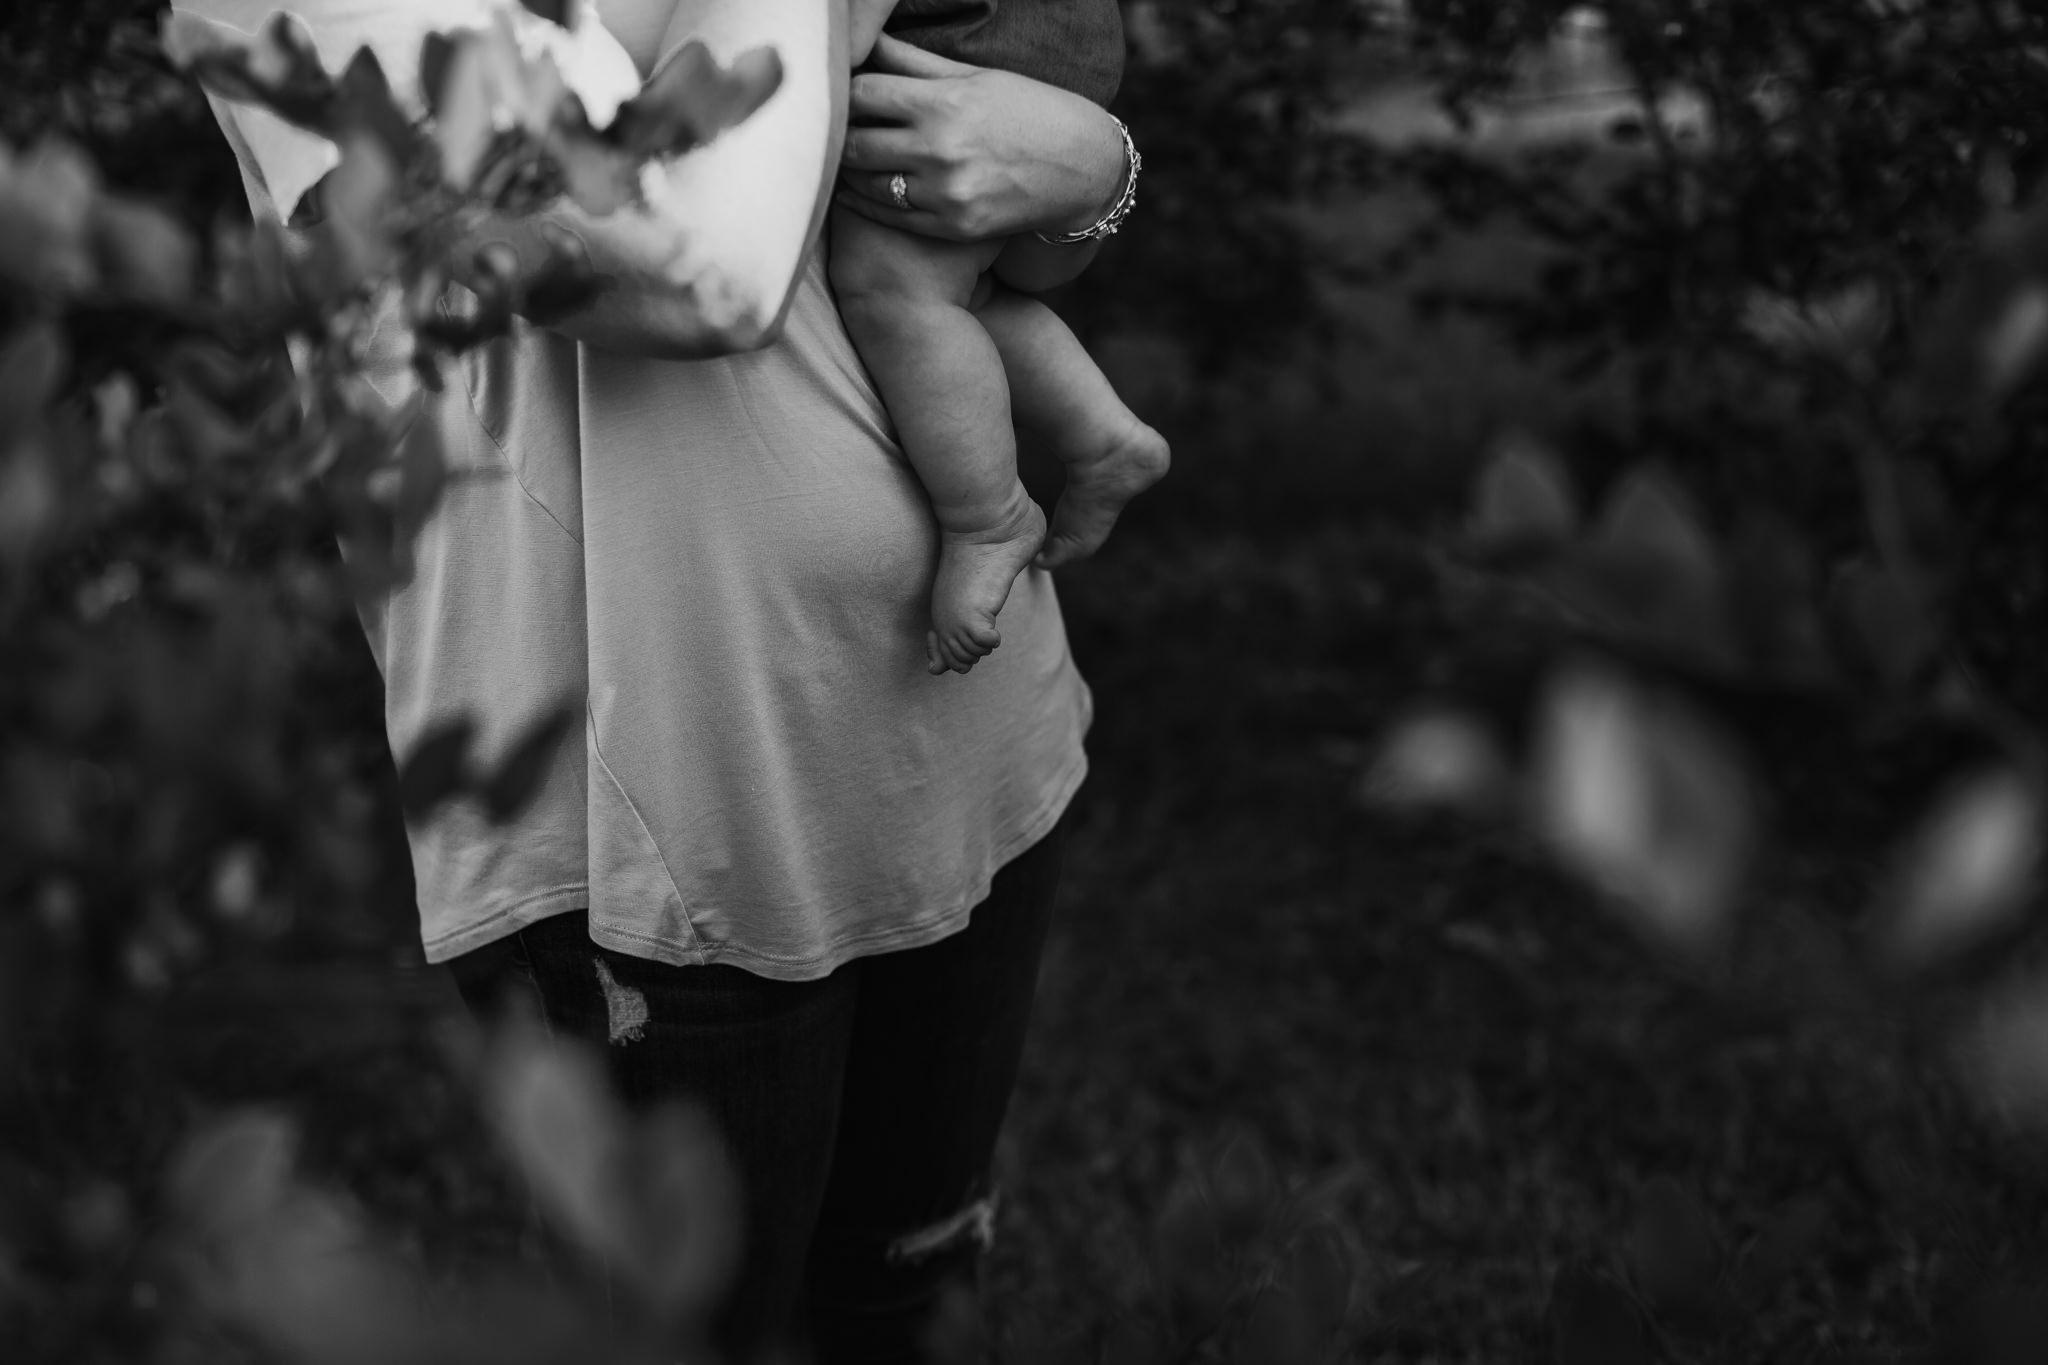 memphis-family-photographer-cassie-cook-photography-64.jpg